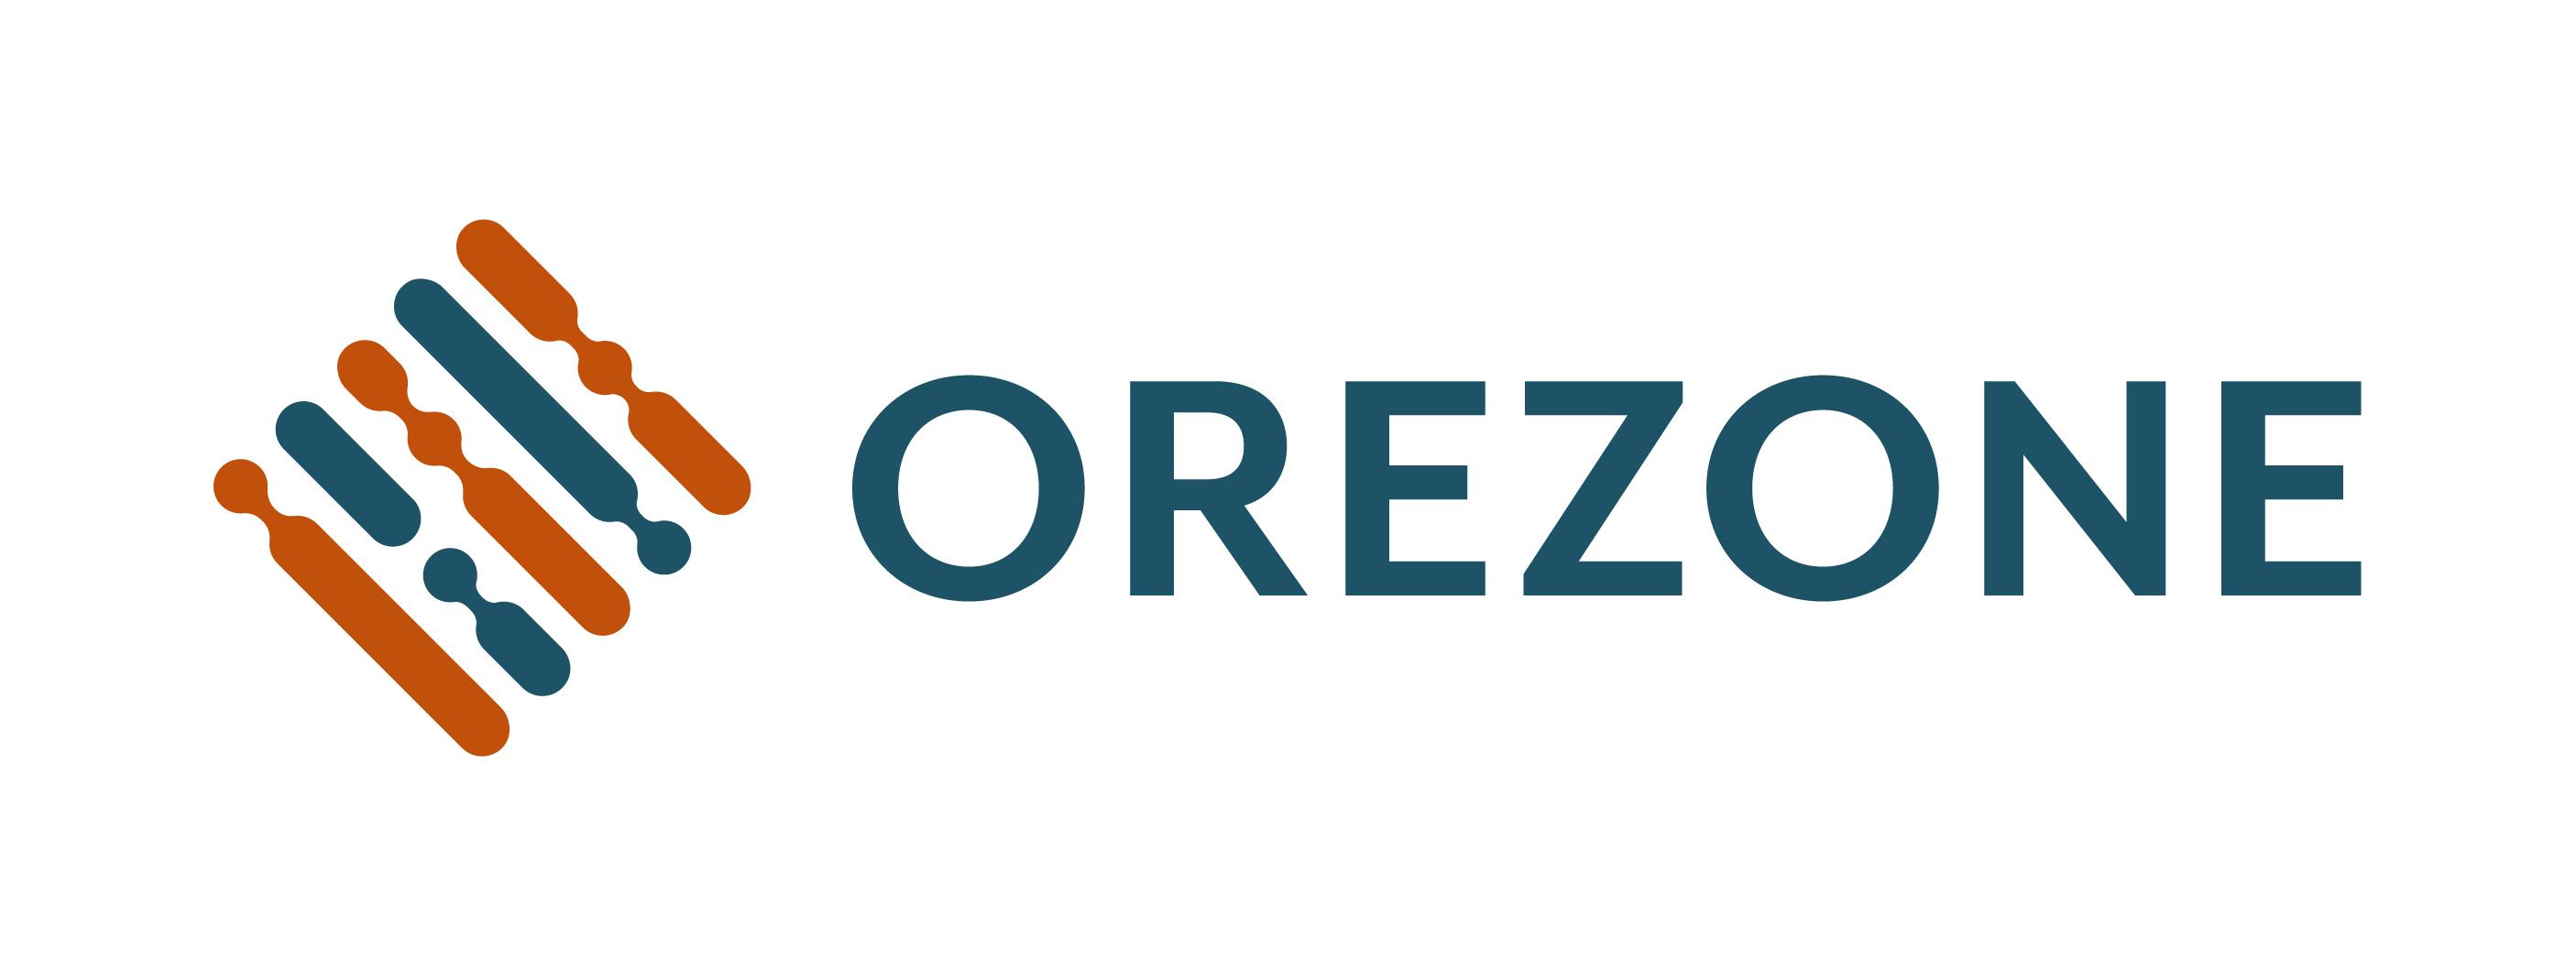 Orezone Files Final Base Shelf Prospectus